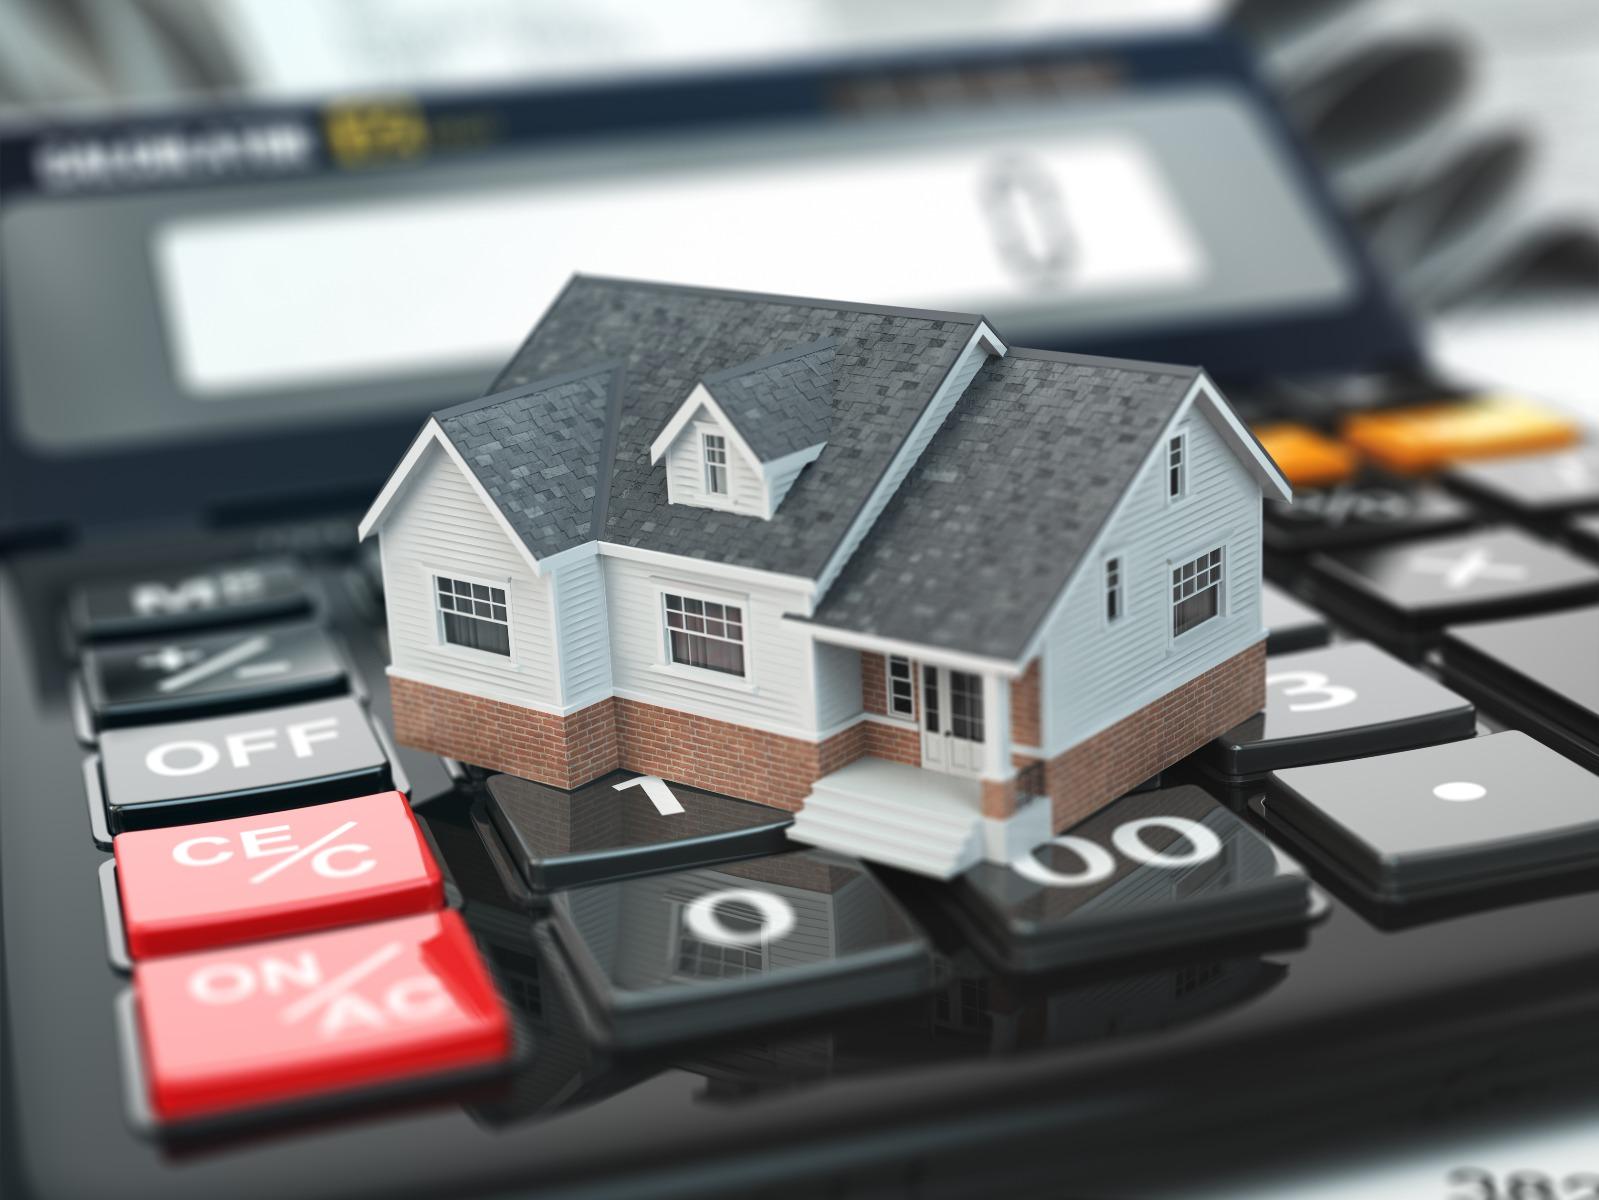 model house on calculator